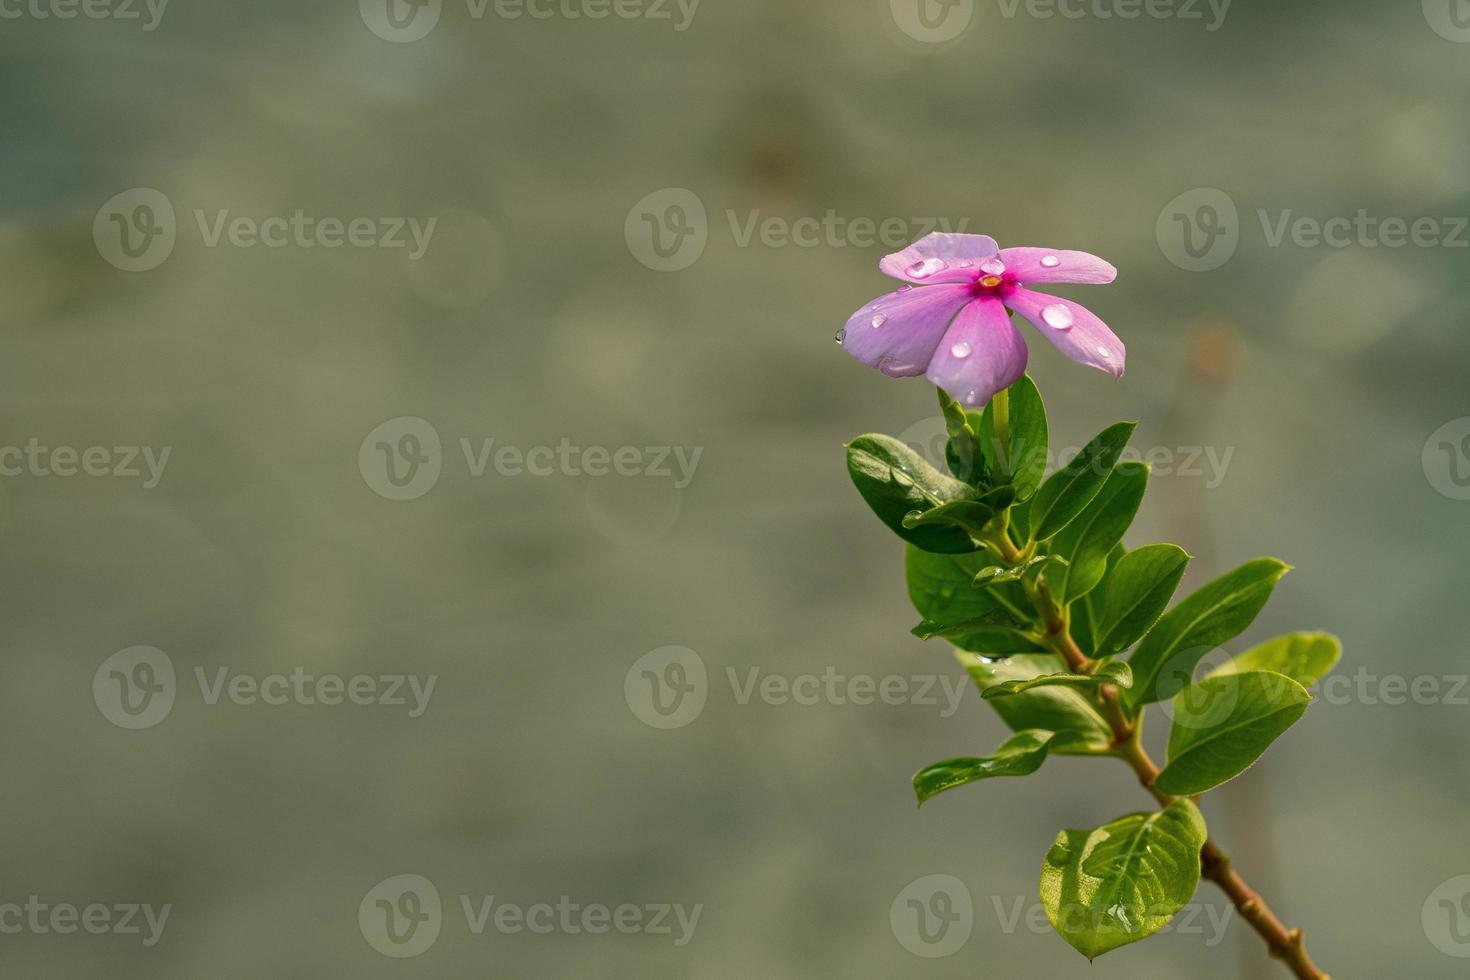 Beautiful flower background, colorful nature photo